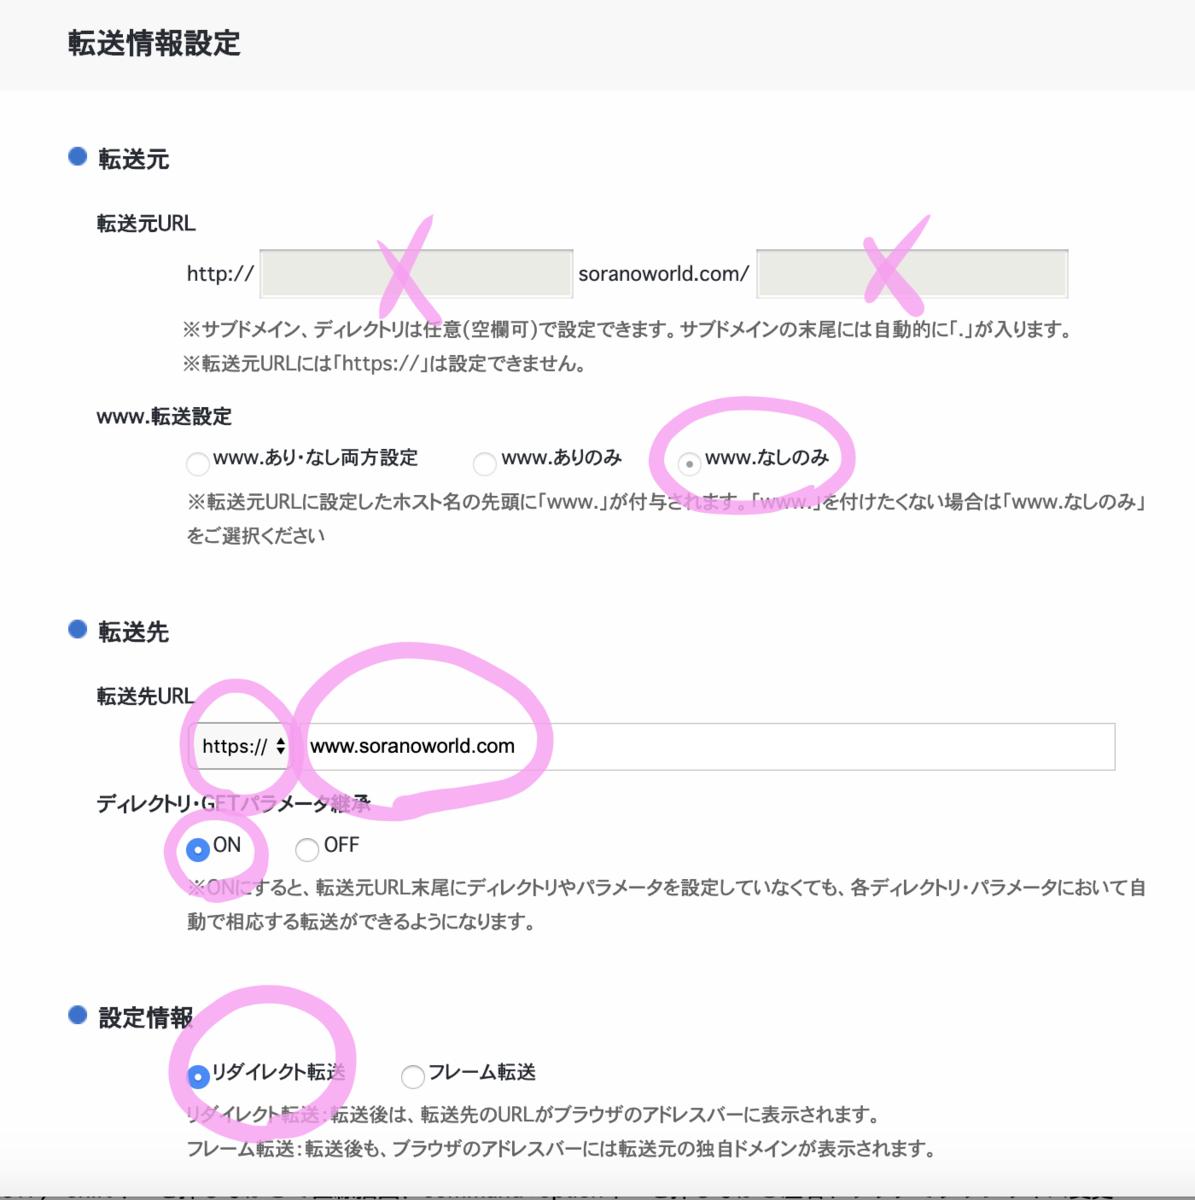 f:id:shirokuma-yu:20190921015017p:plain